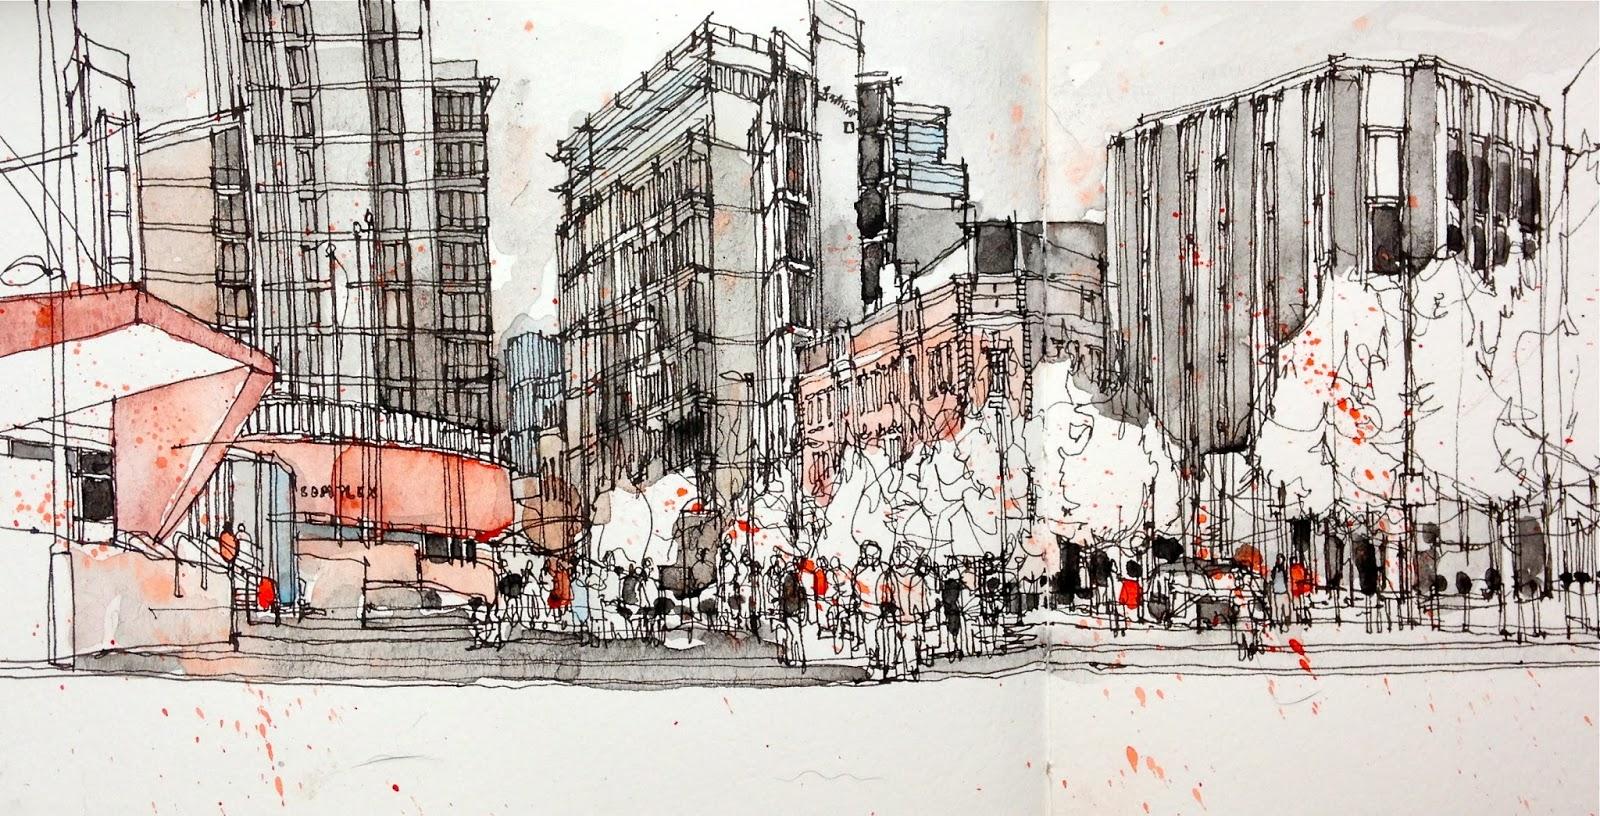 4th International Urban Sketching Symposium Recent